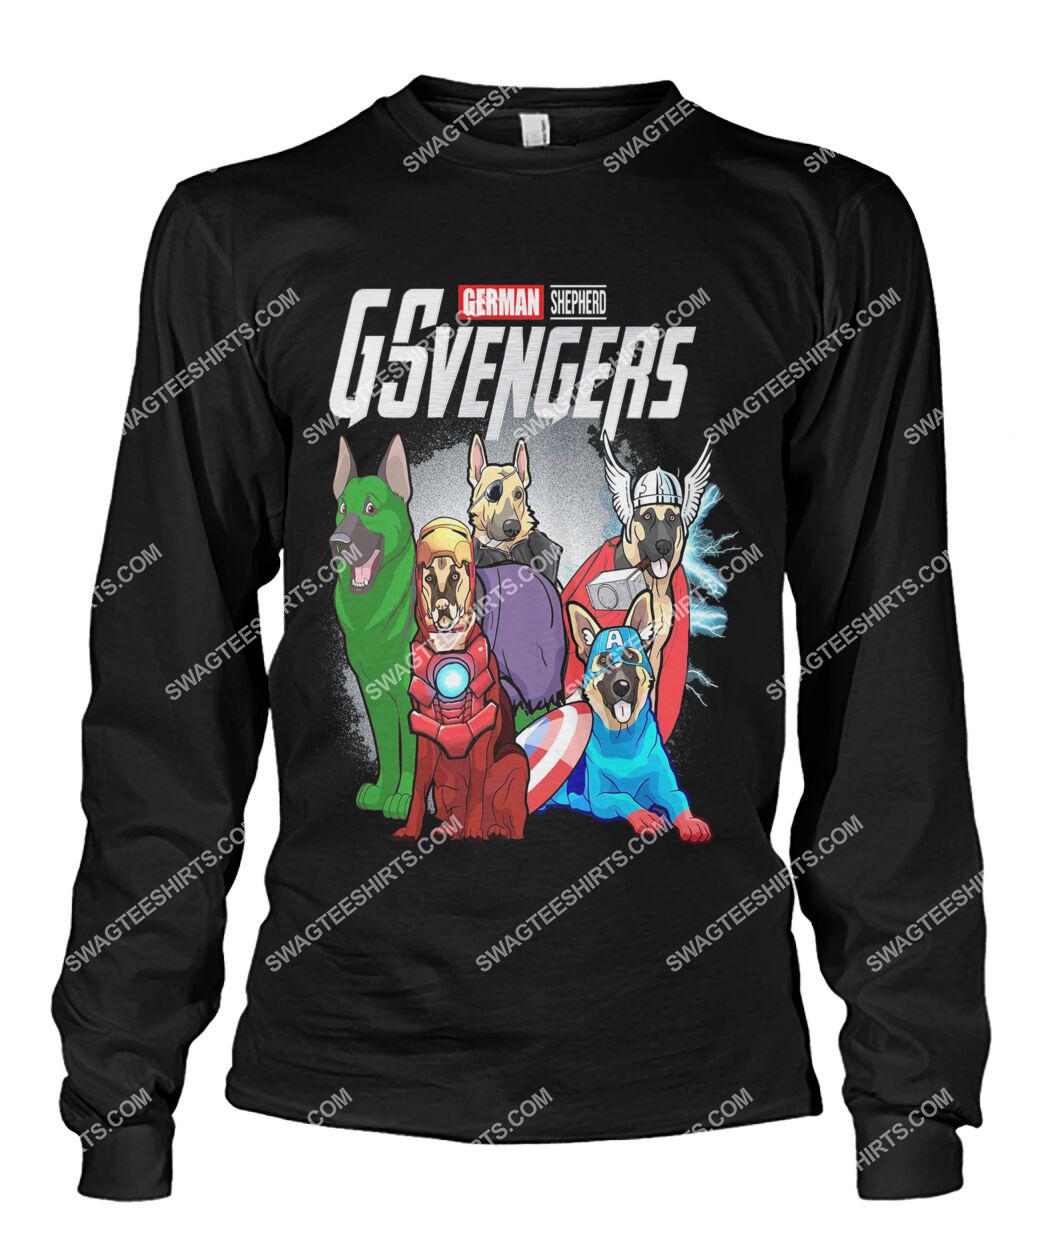 german shepherd gsvengers marvel avengers dogs lover sweatshirt 1